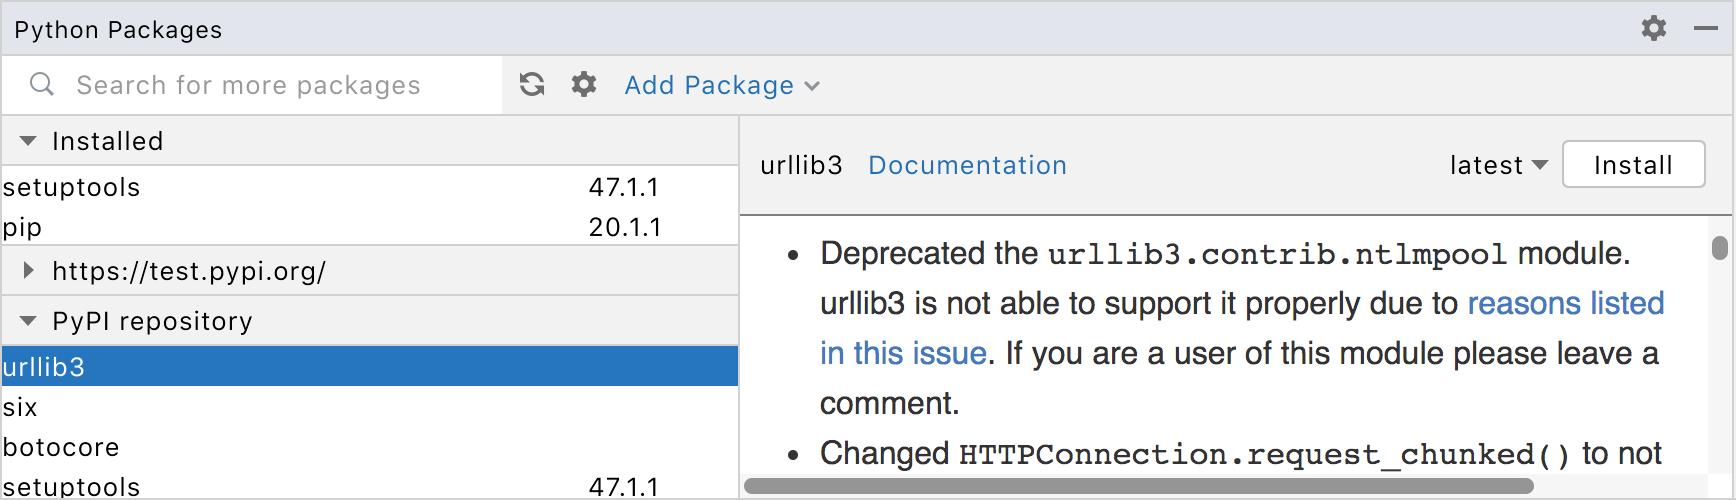 Python Package tool window